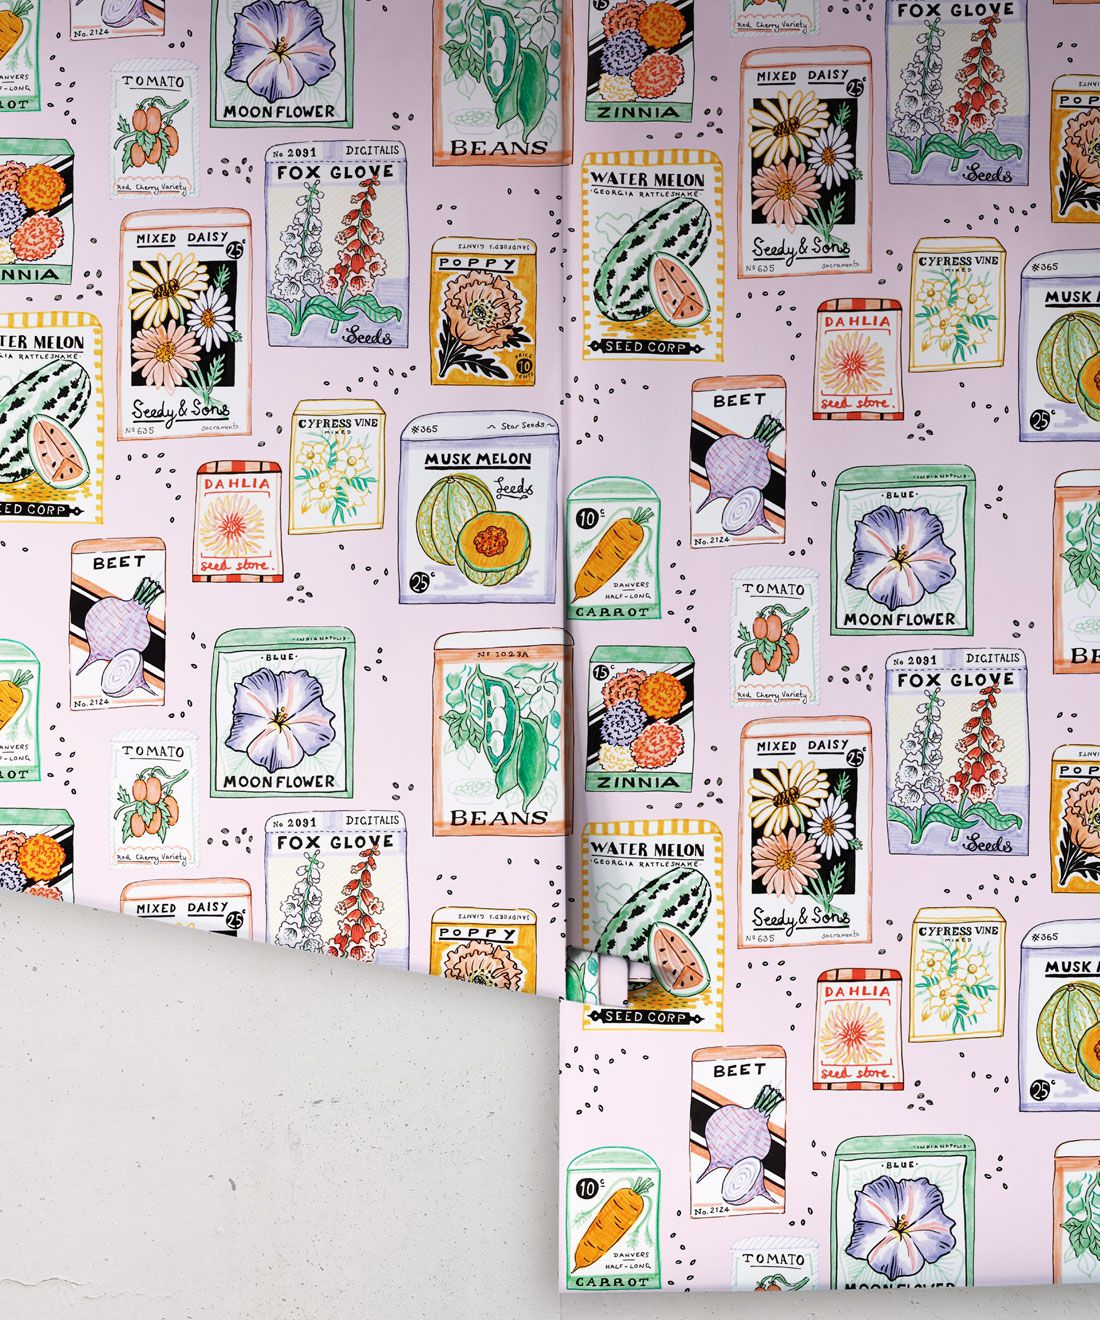 Seed Packets Wallpaper featuring watermelon, carrot, beet, beans, poppy, daisy rolls